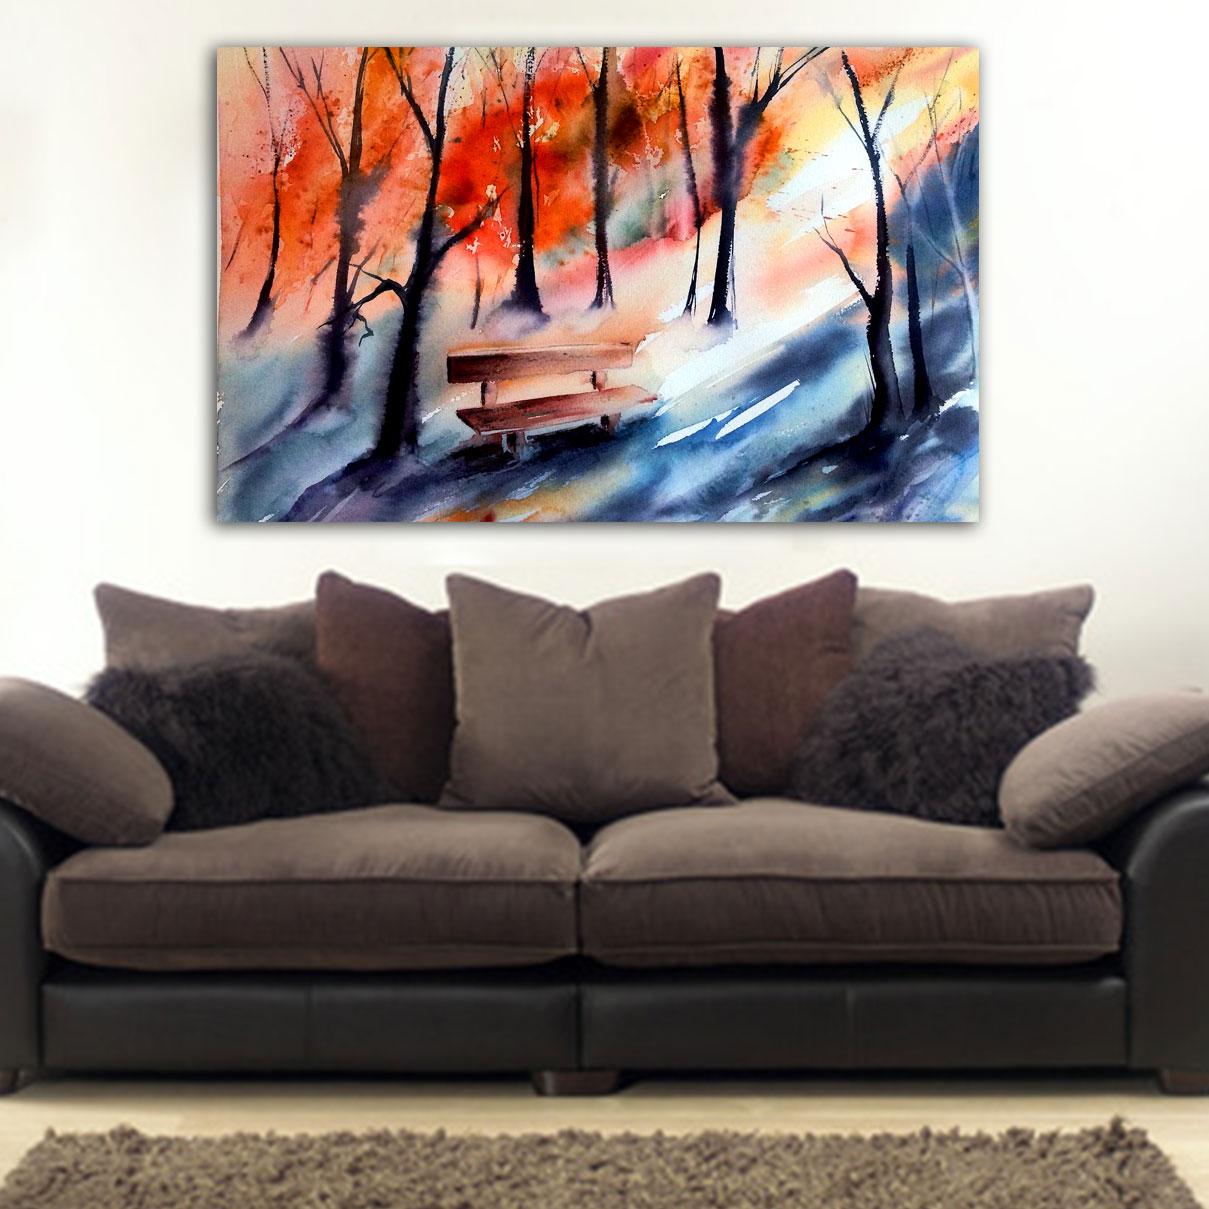 f0891ae3747 Πίνακας σε καμβά παγκάκι στο δάσος - Ninesix.gr